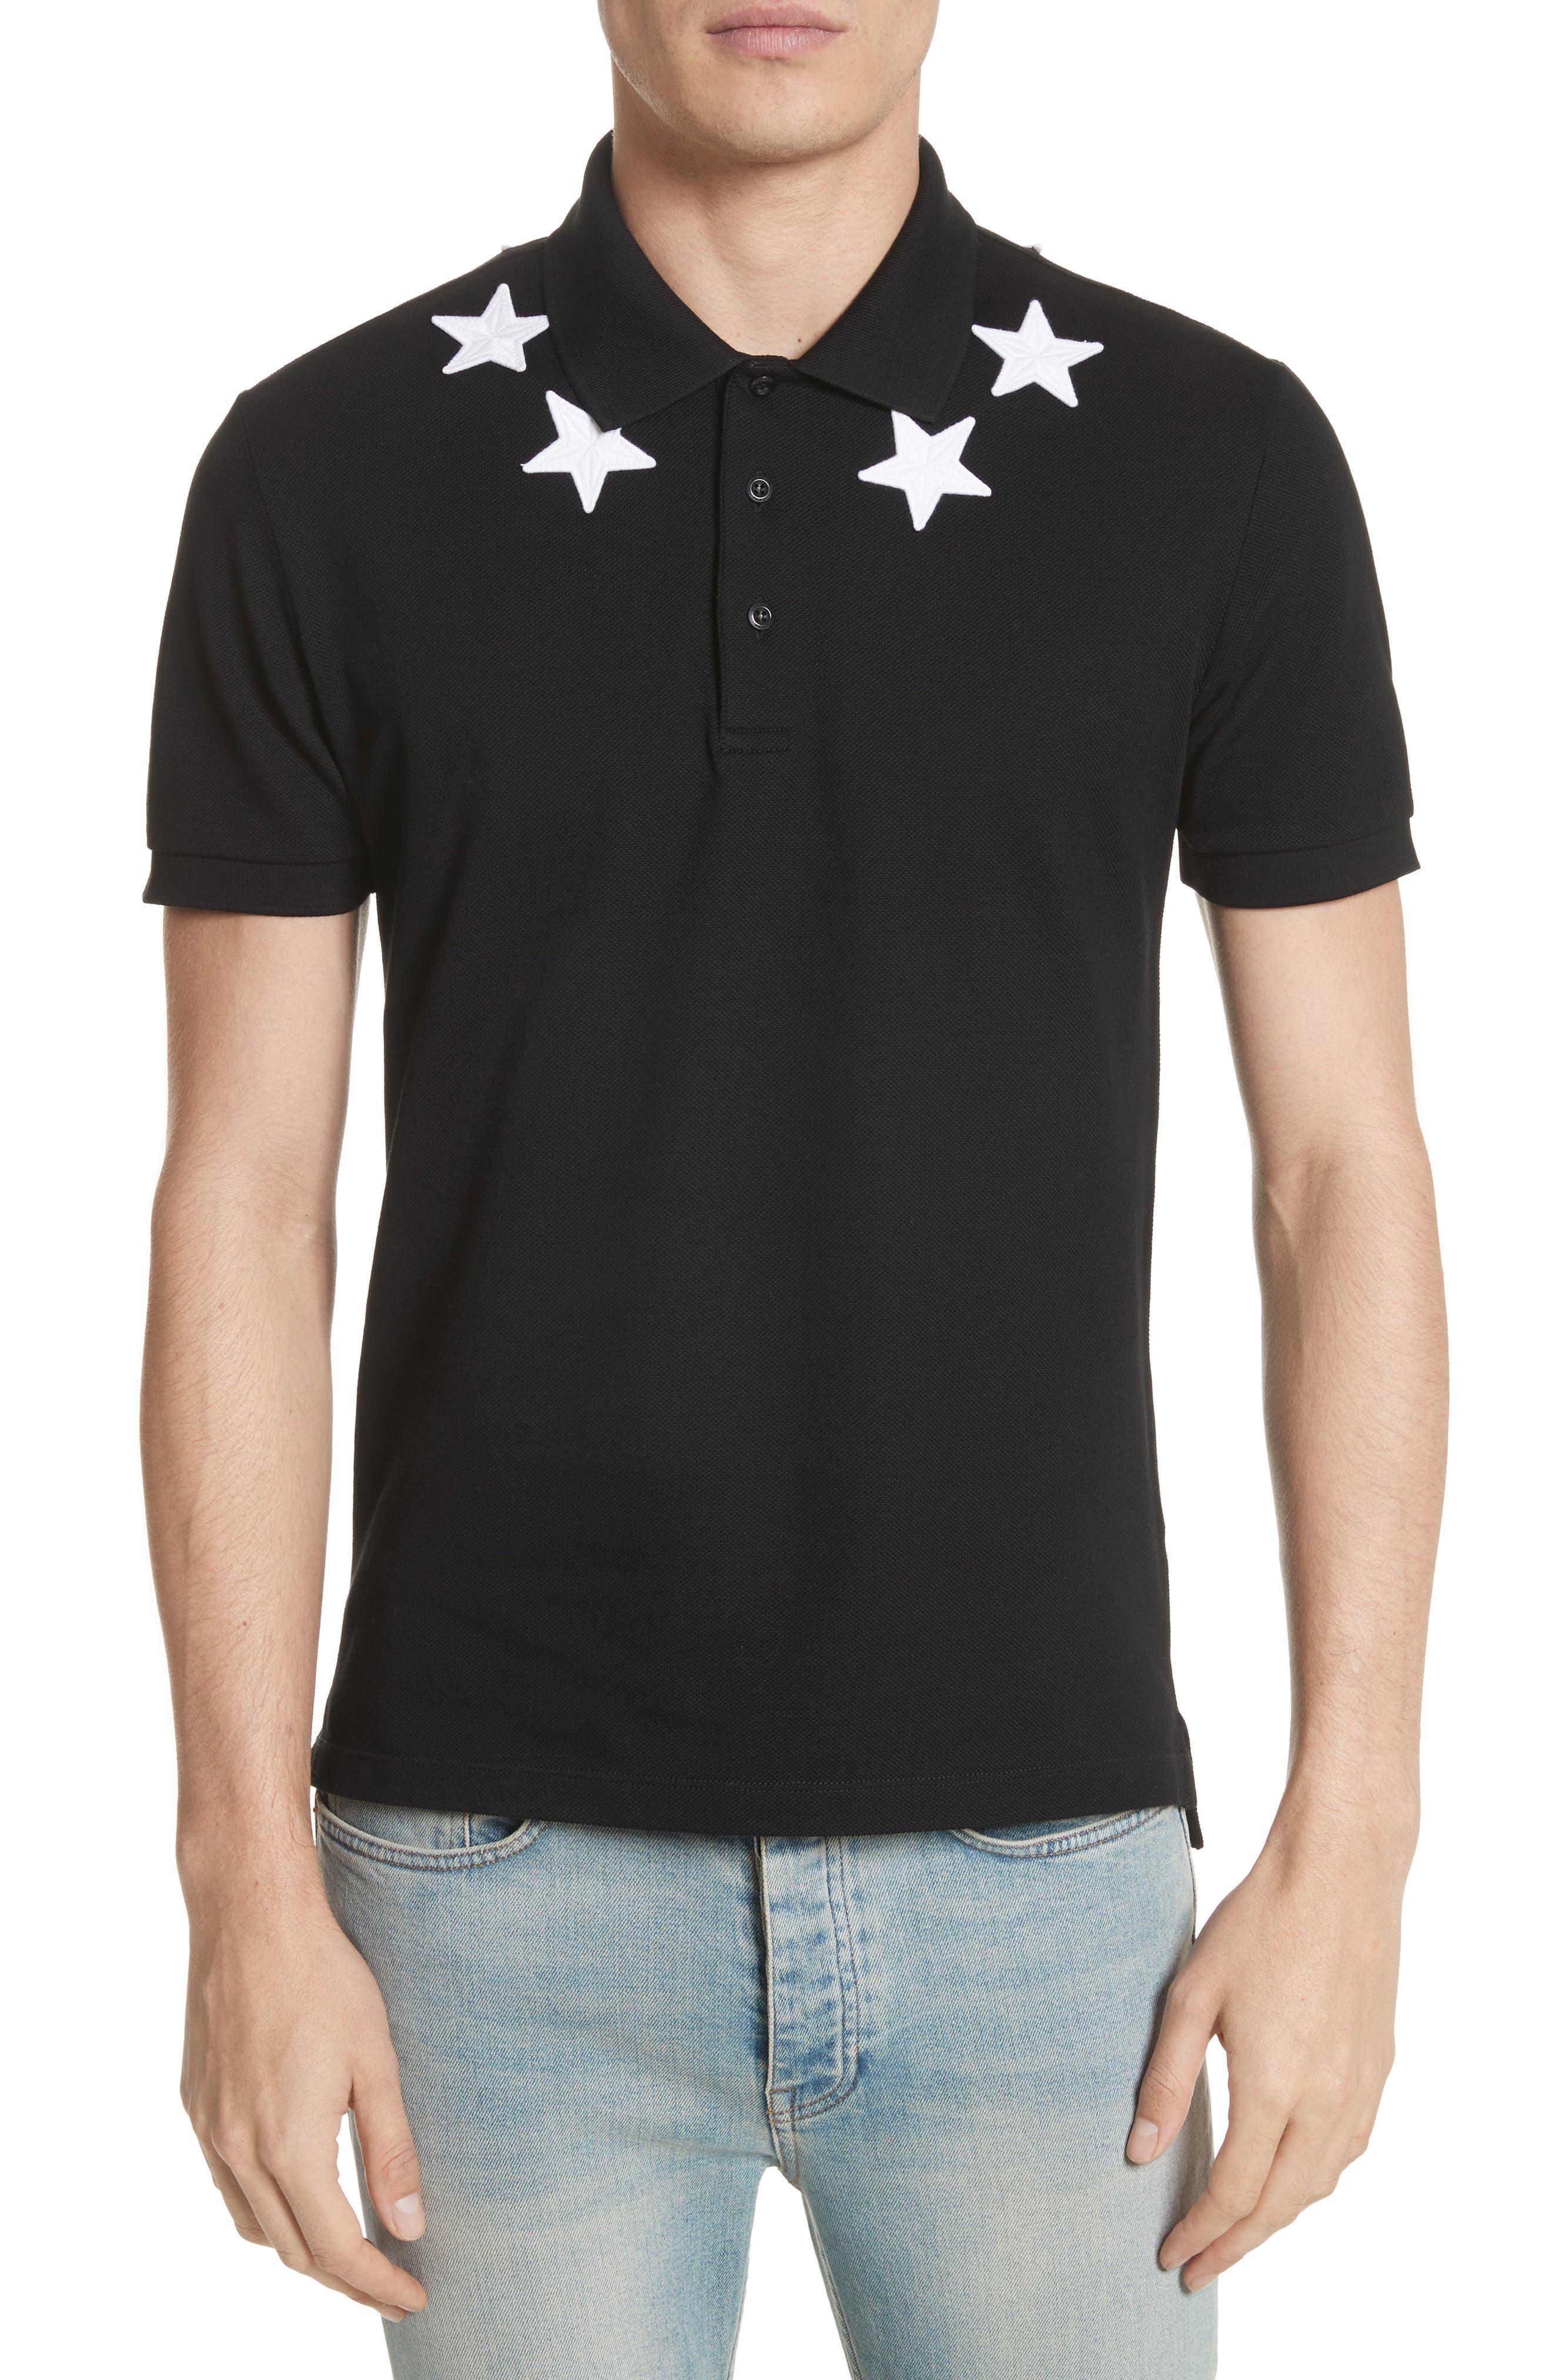 Alternate Image 1 Selected - Givenchy Star Polo Shirt